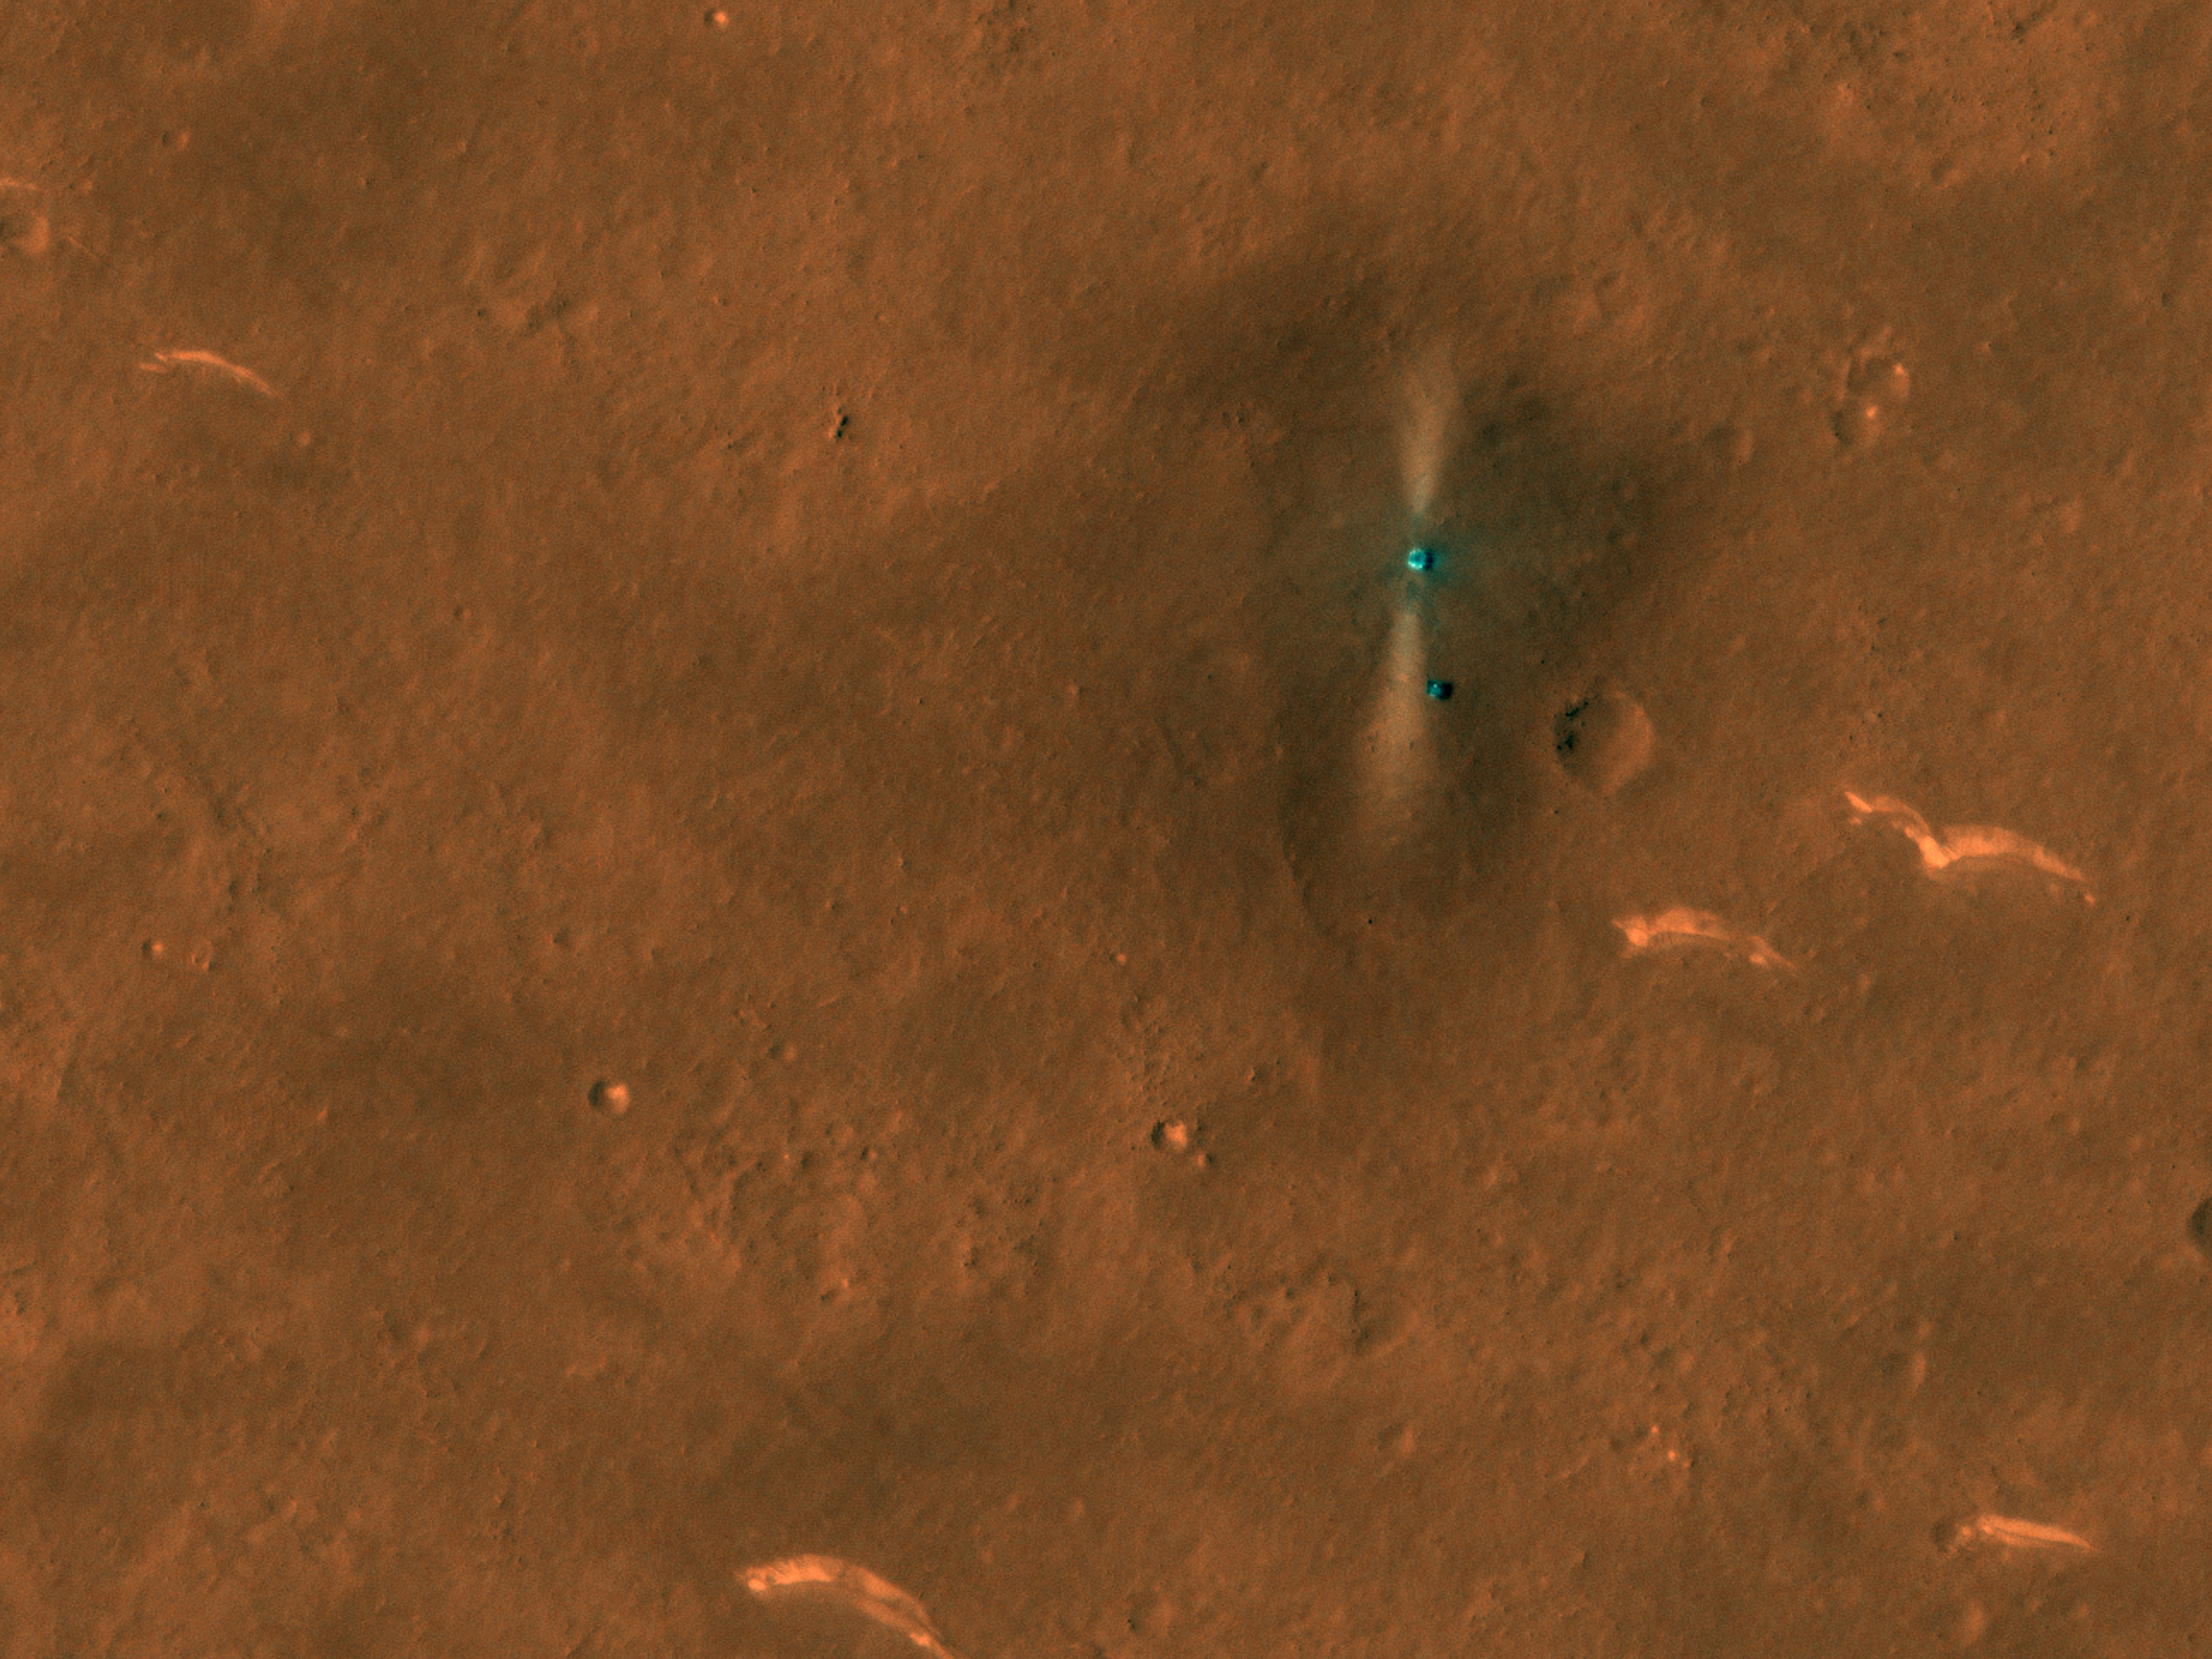 Tianwen-1 Lander and Zhurong Rover in Southern Utopia Planitia